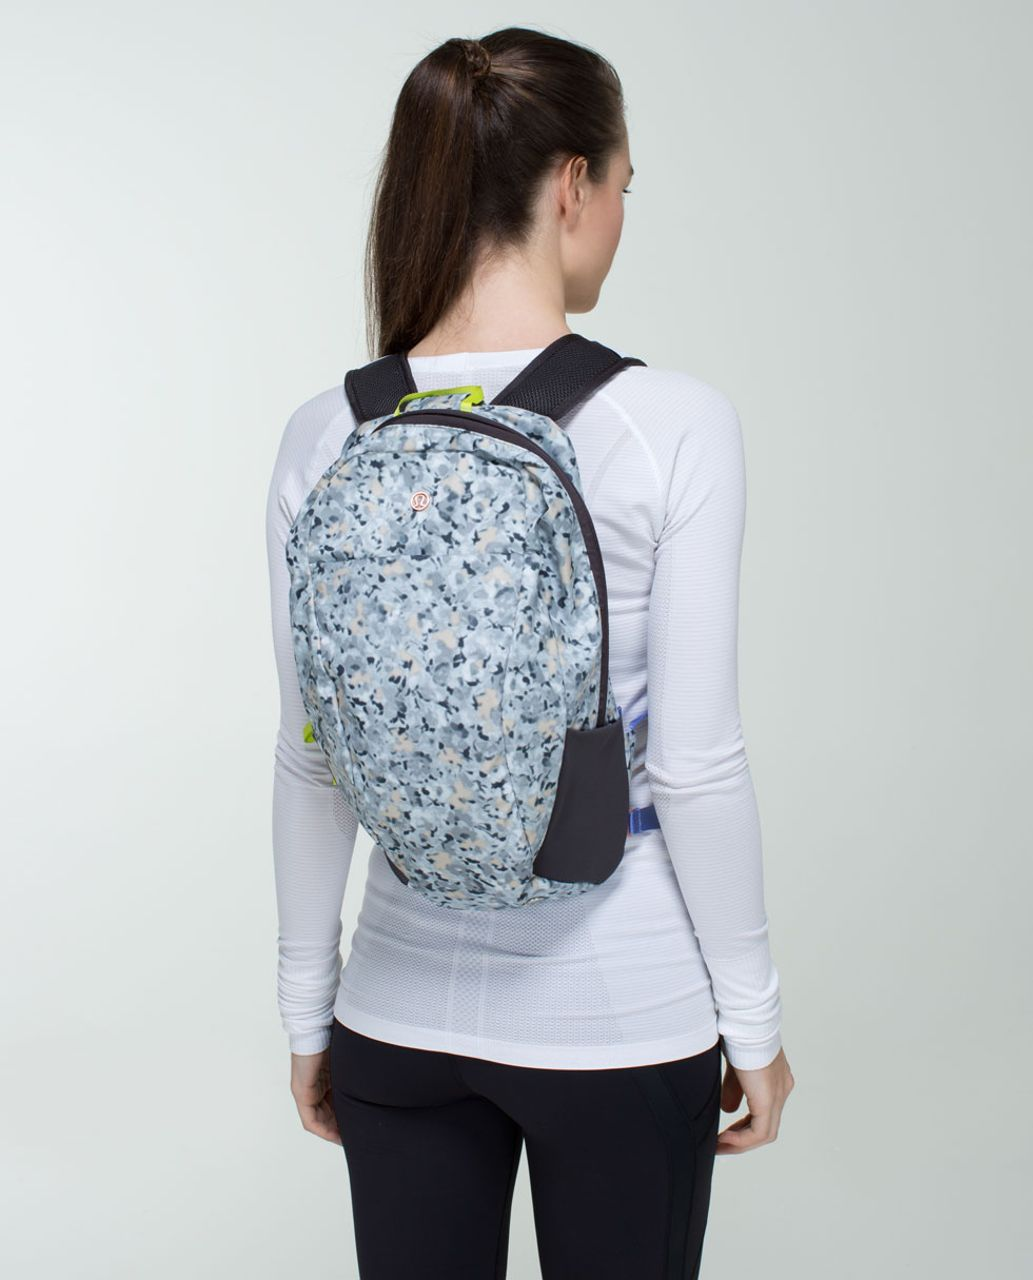 Lululemon Run From Work Backpack - Not So Petite Fleur Silver Spoon